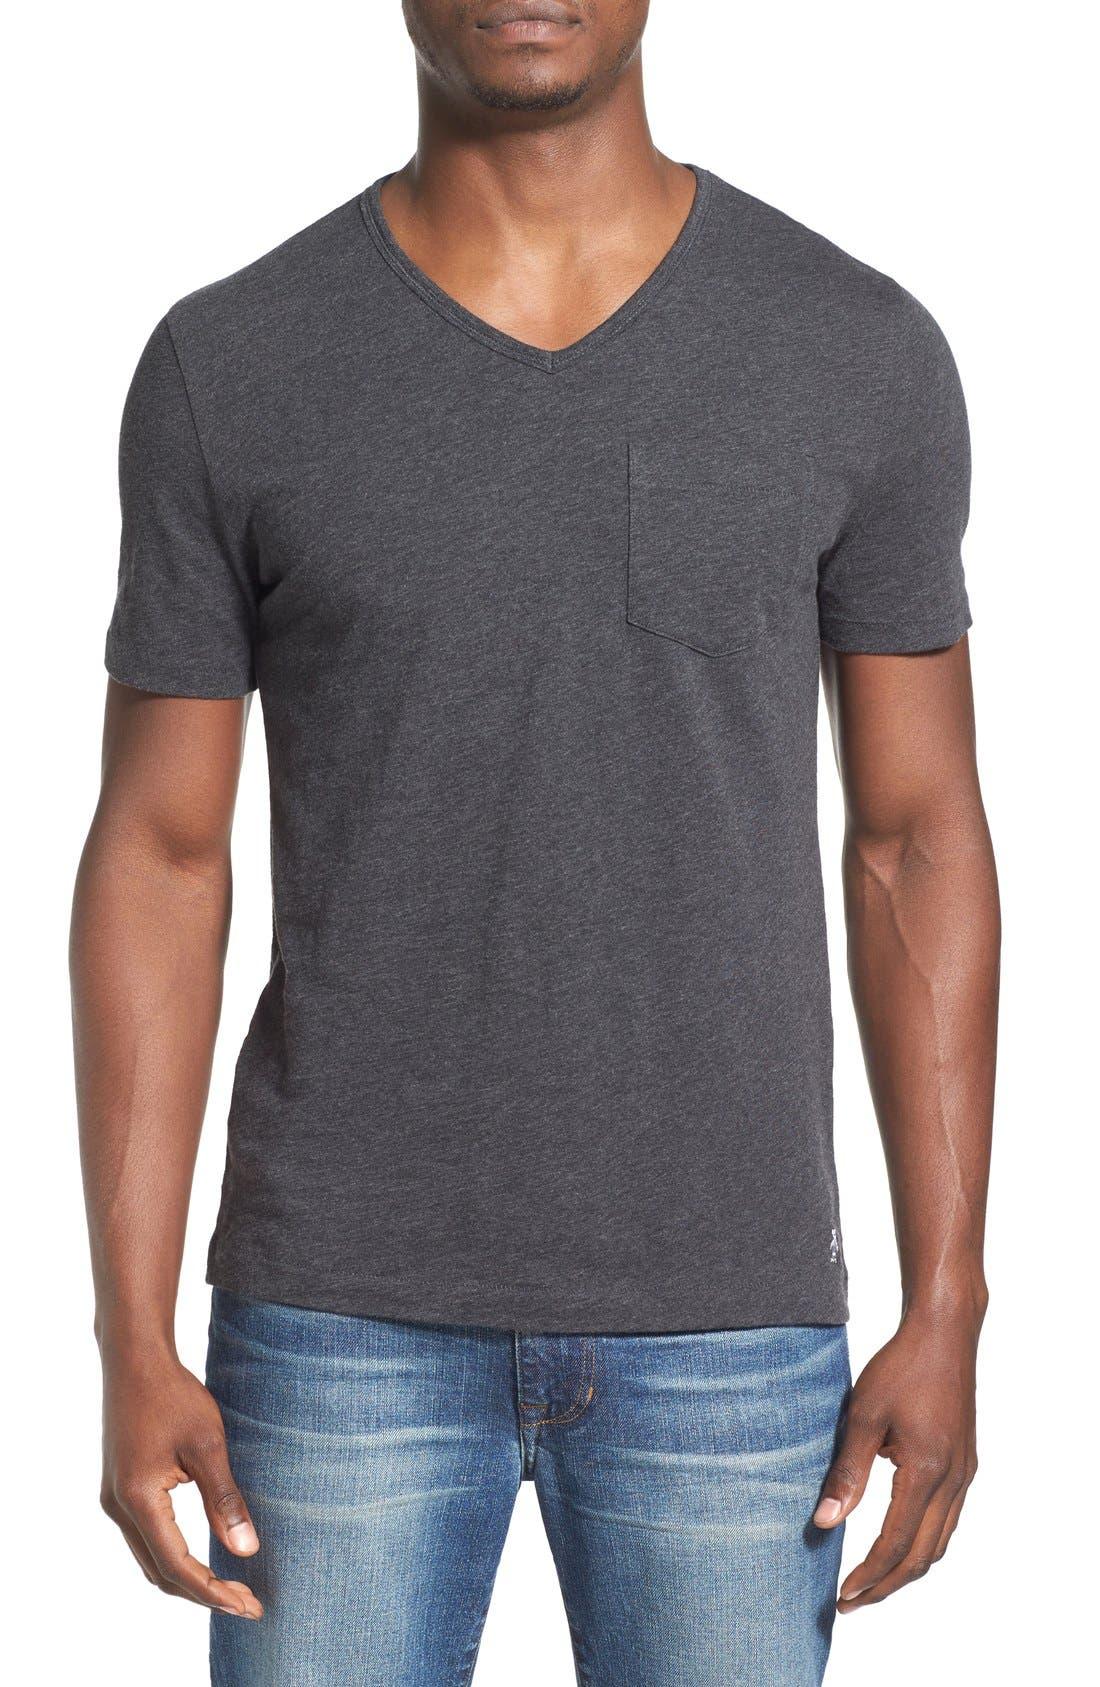 'Bing' V-Neck Pocket T-Shirt,                             Main thumbnail 1, color,                             Dark Charcoal Heather